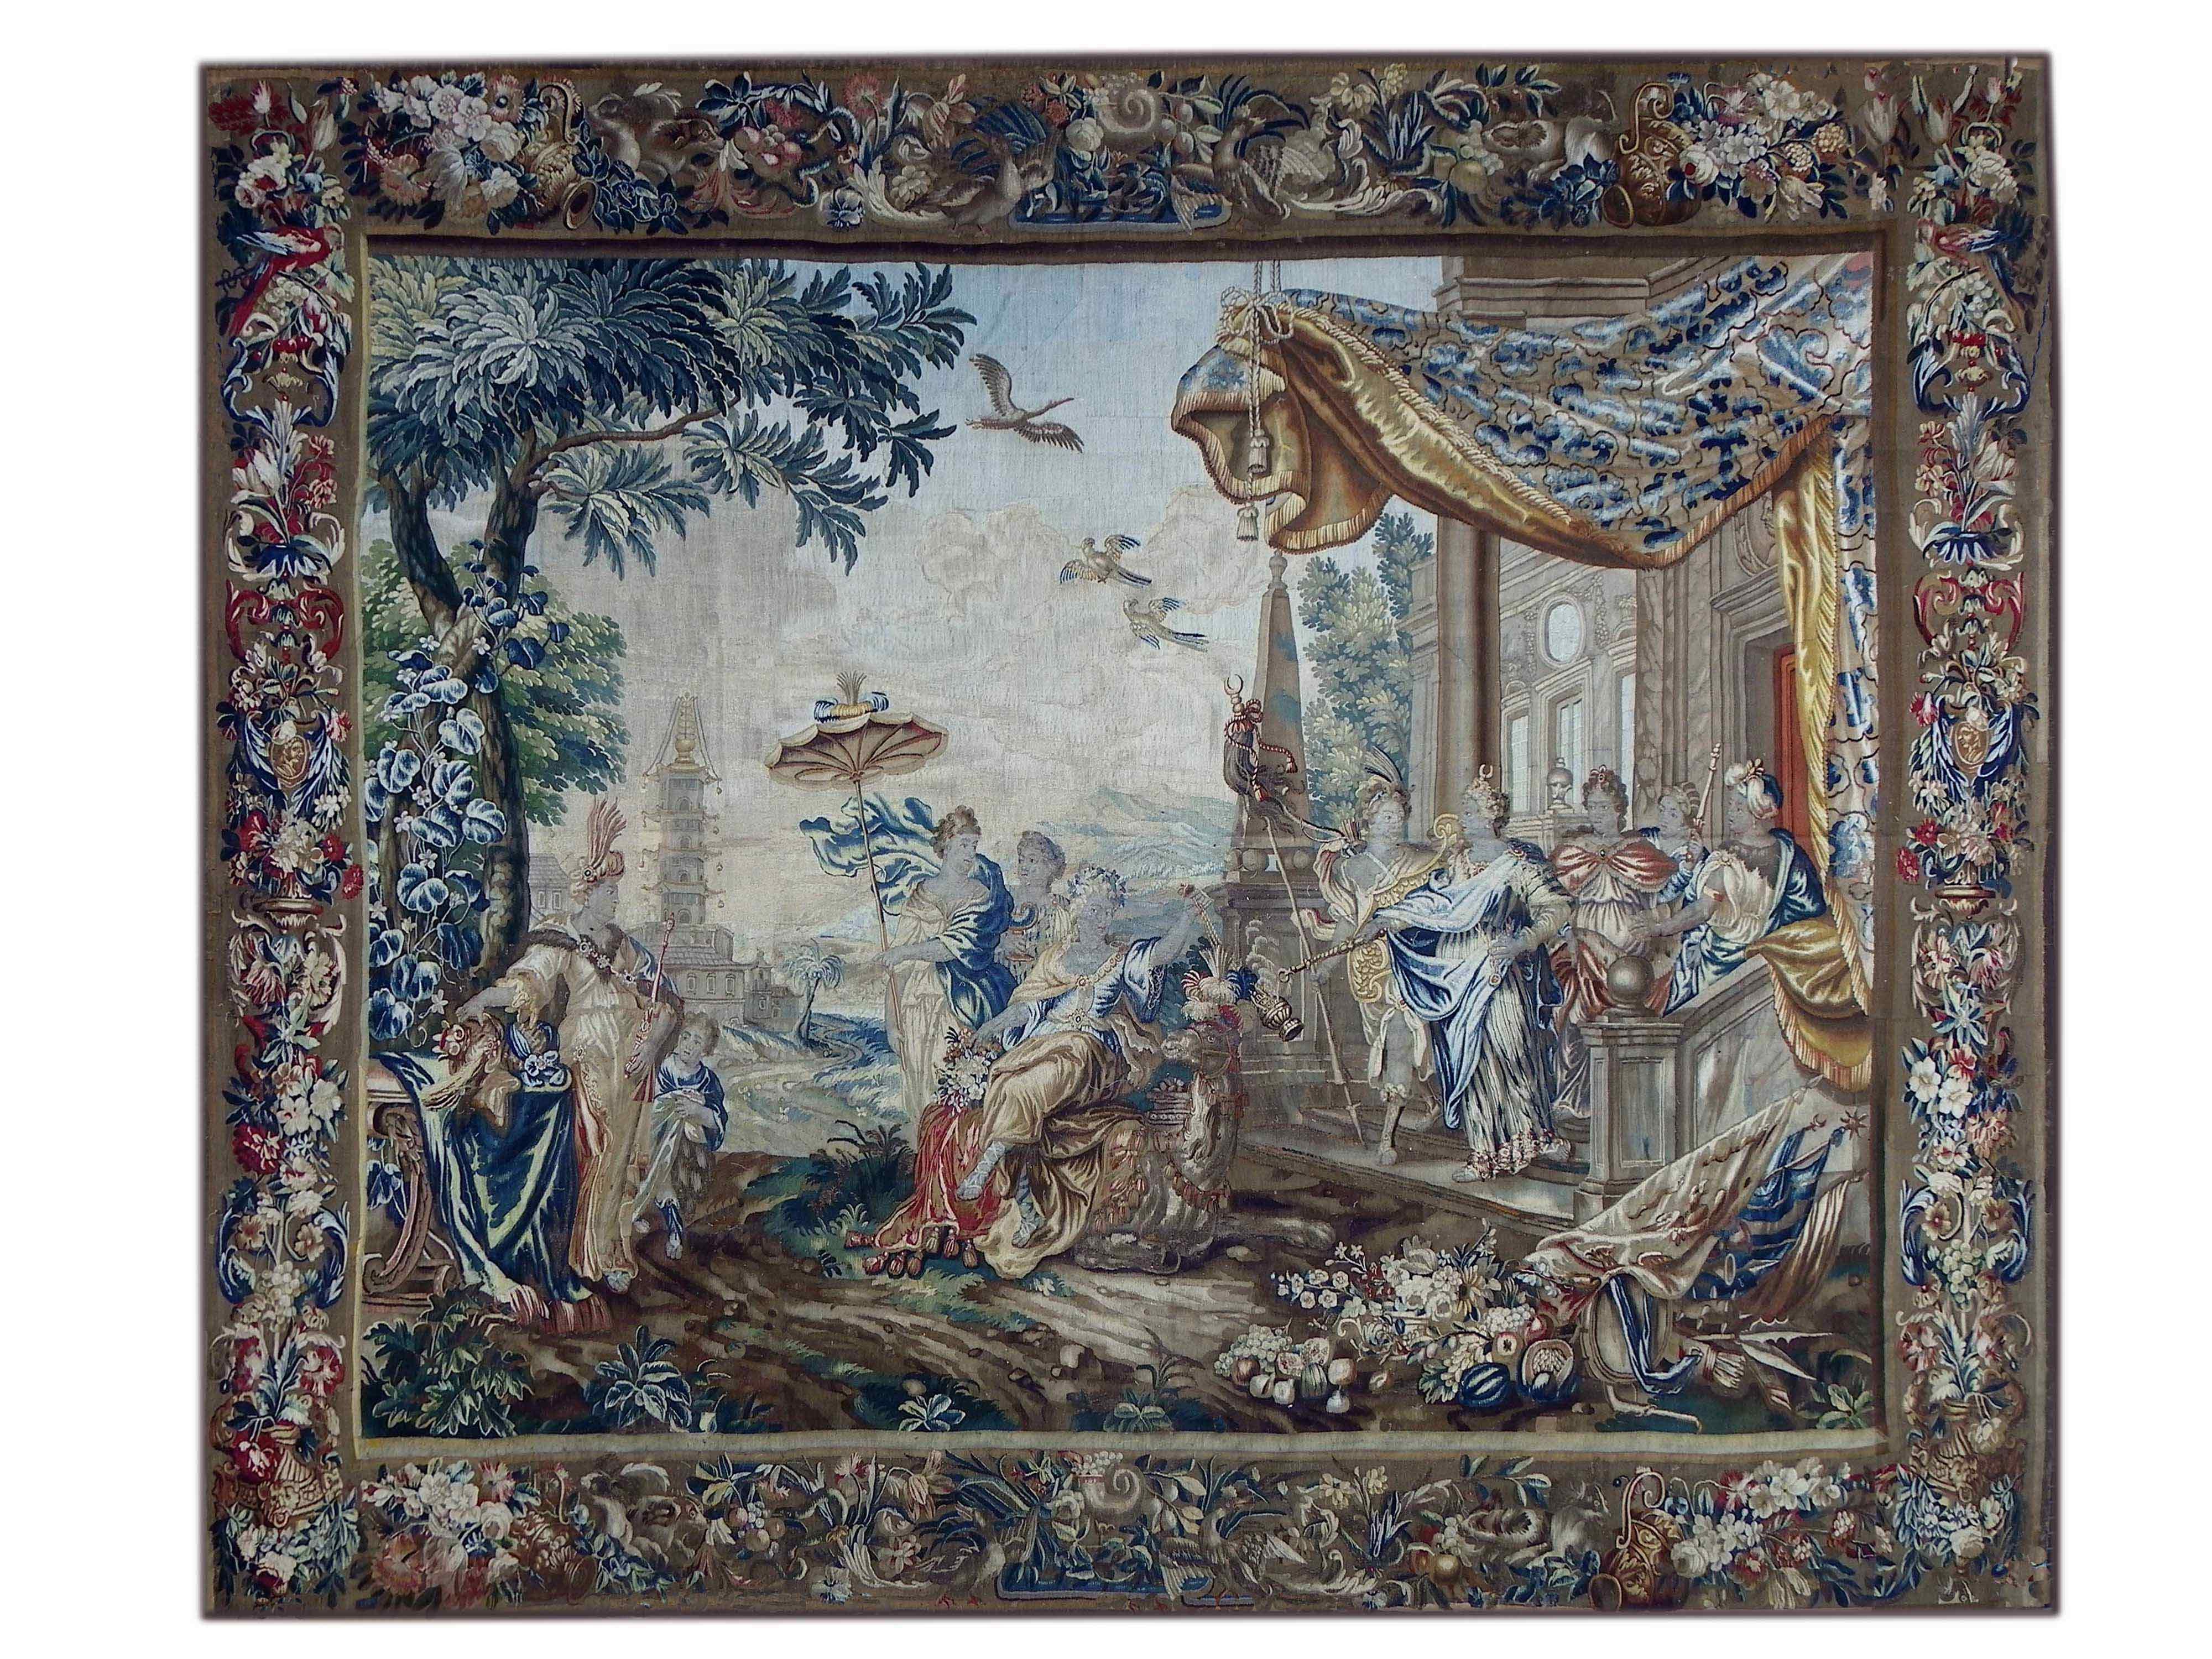 Manifattura Reale di Bruxelles Tapestry - XVII